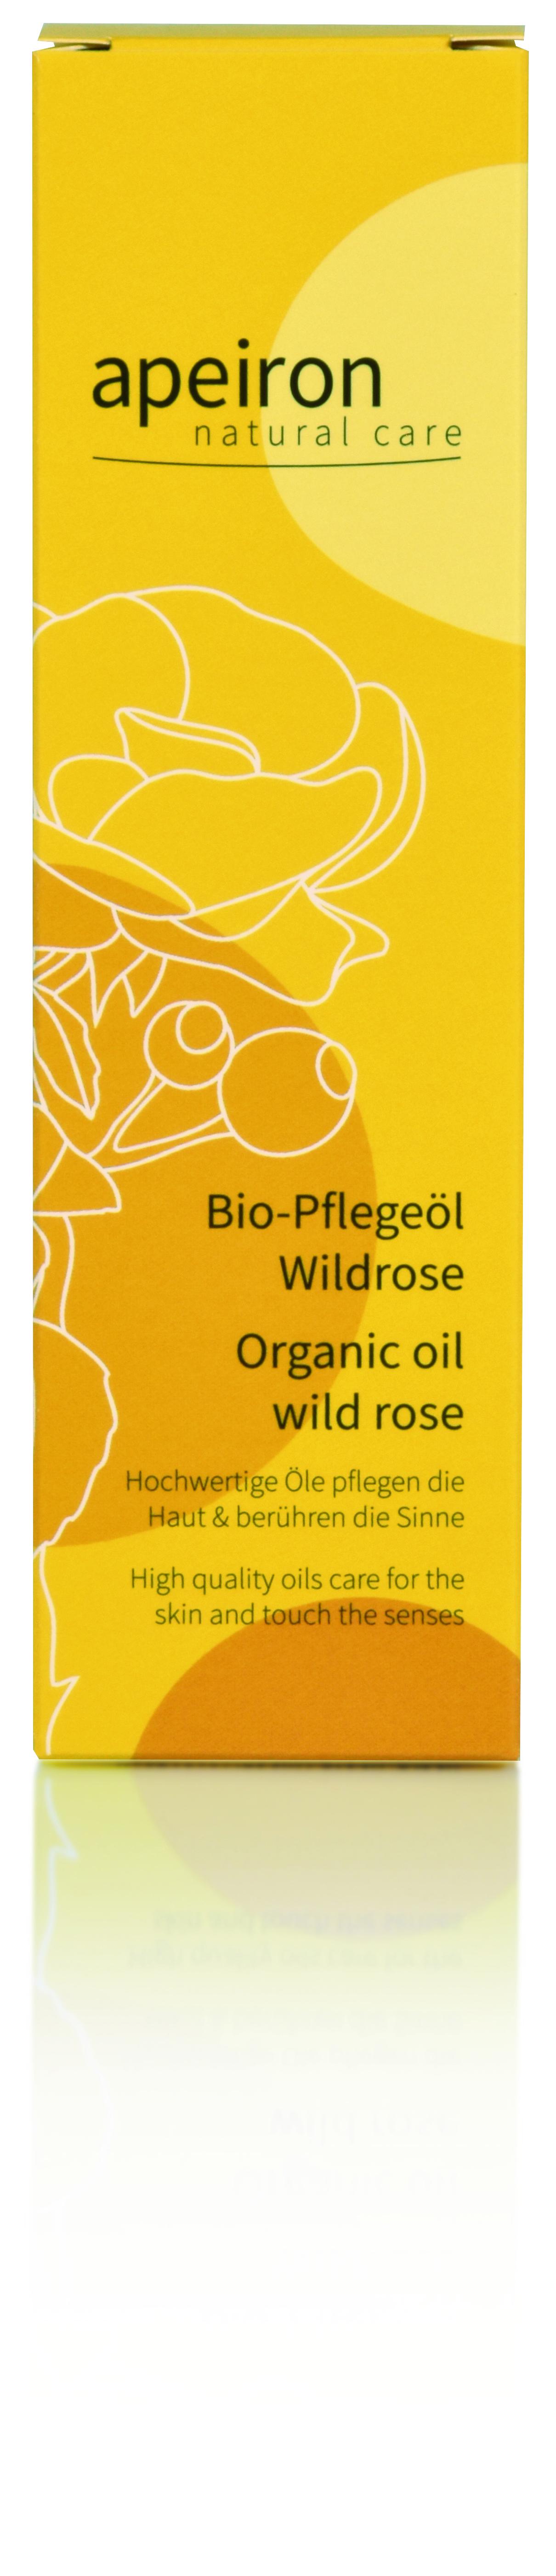 Bio-Pflegeöl Wildrose